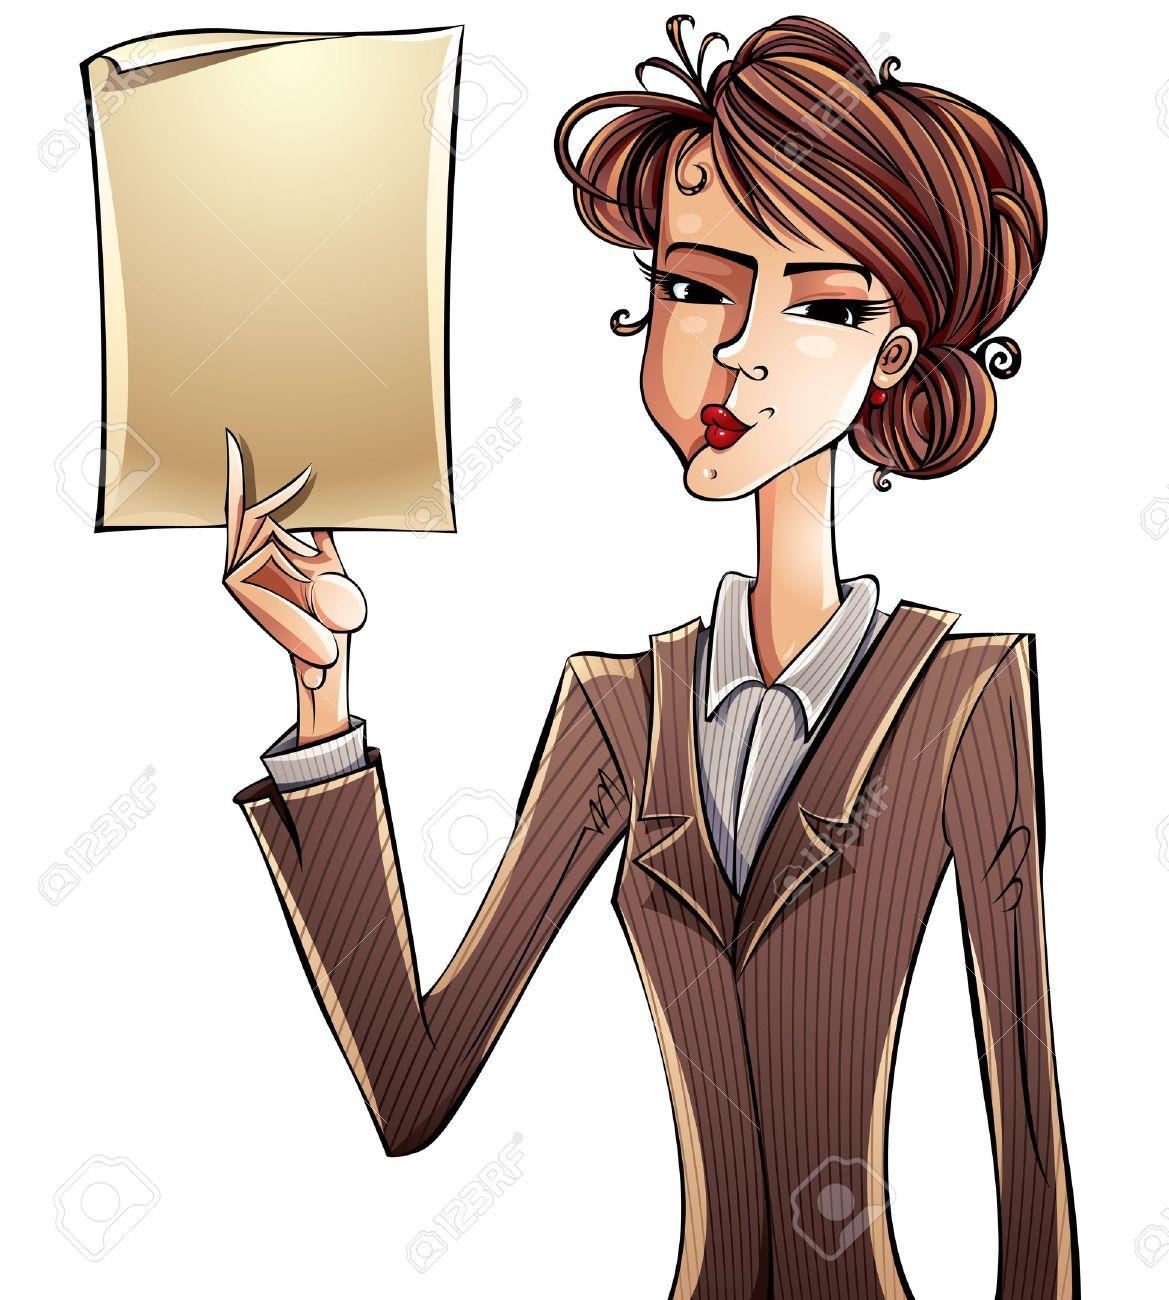 Boss clipart female boss, Boss female boss Transparent ...